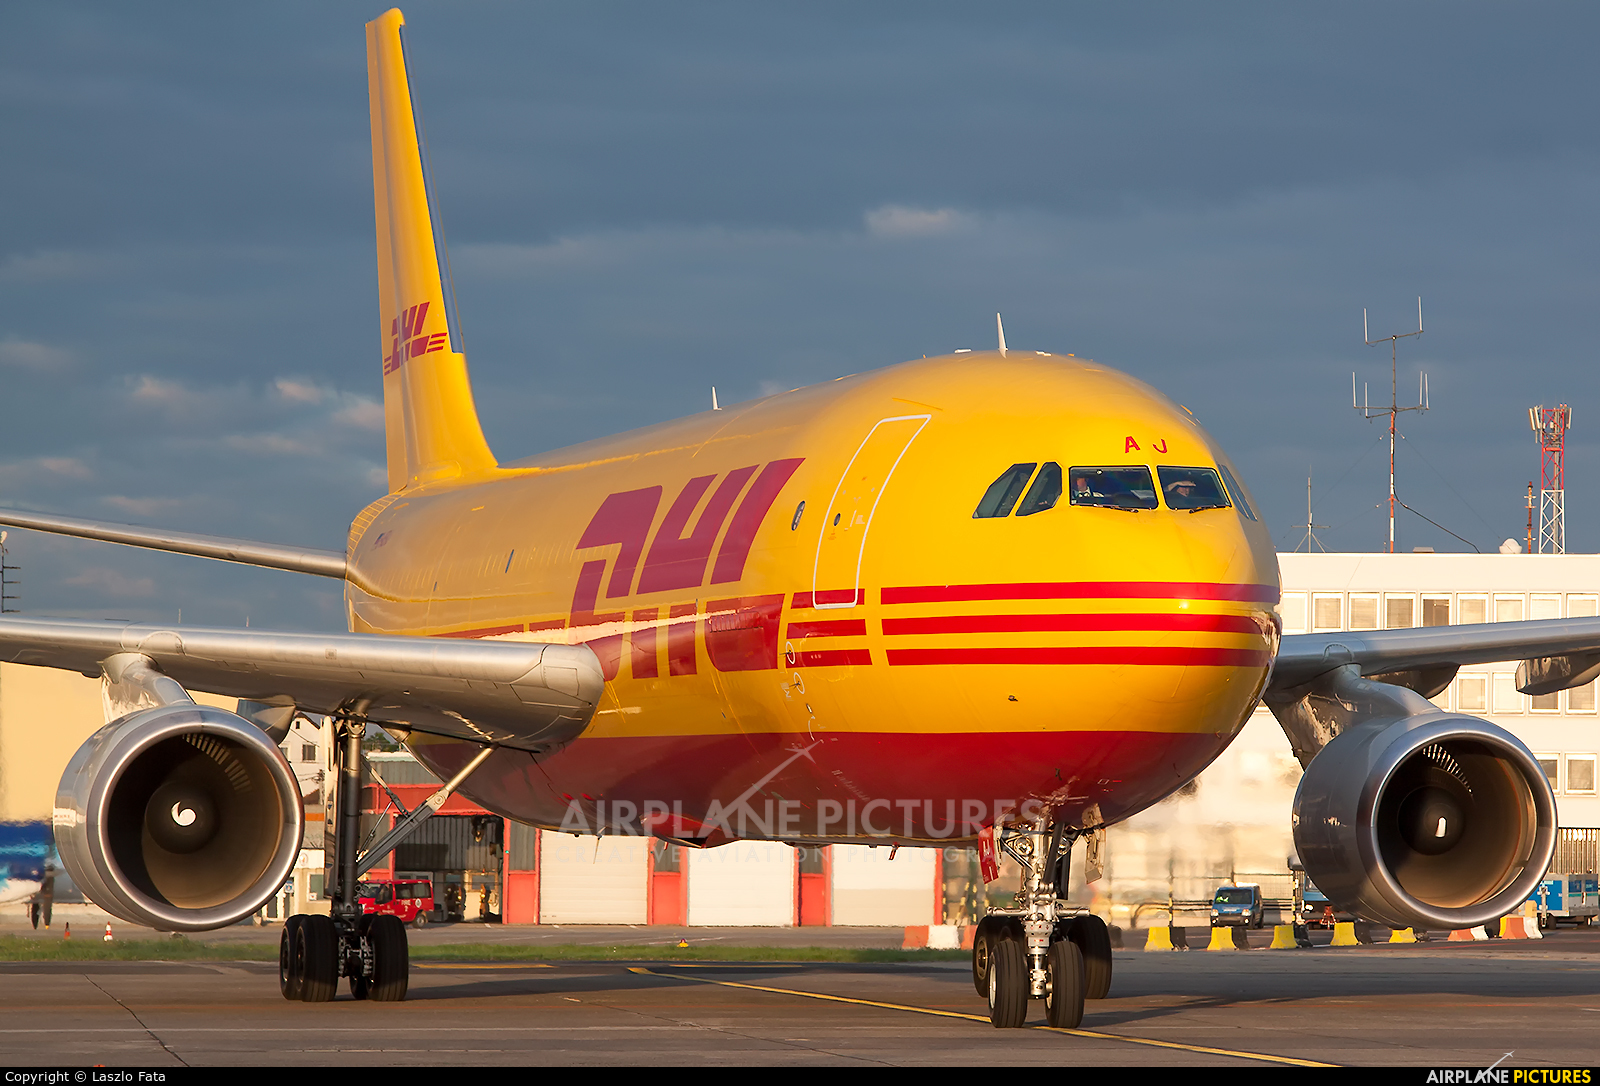 DHL Cargo D-AEAJ aircraft at Budapest Ferenc Liszt International Airport